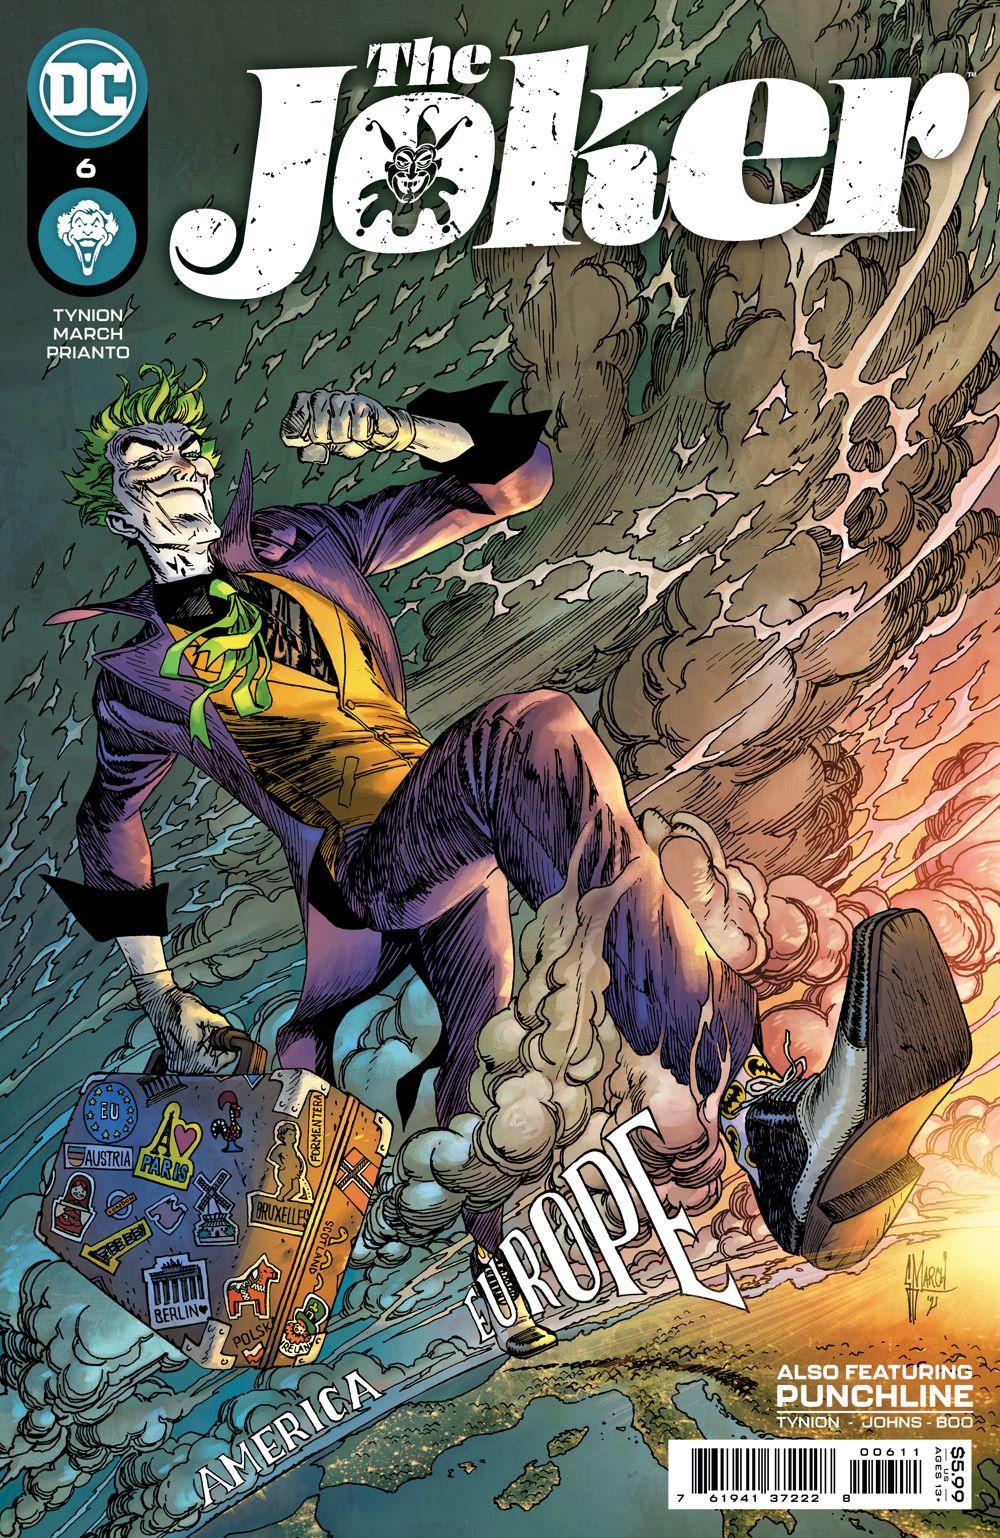 JKR_Cv6 DC Comics August 2021 Solicitations